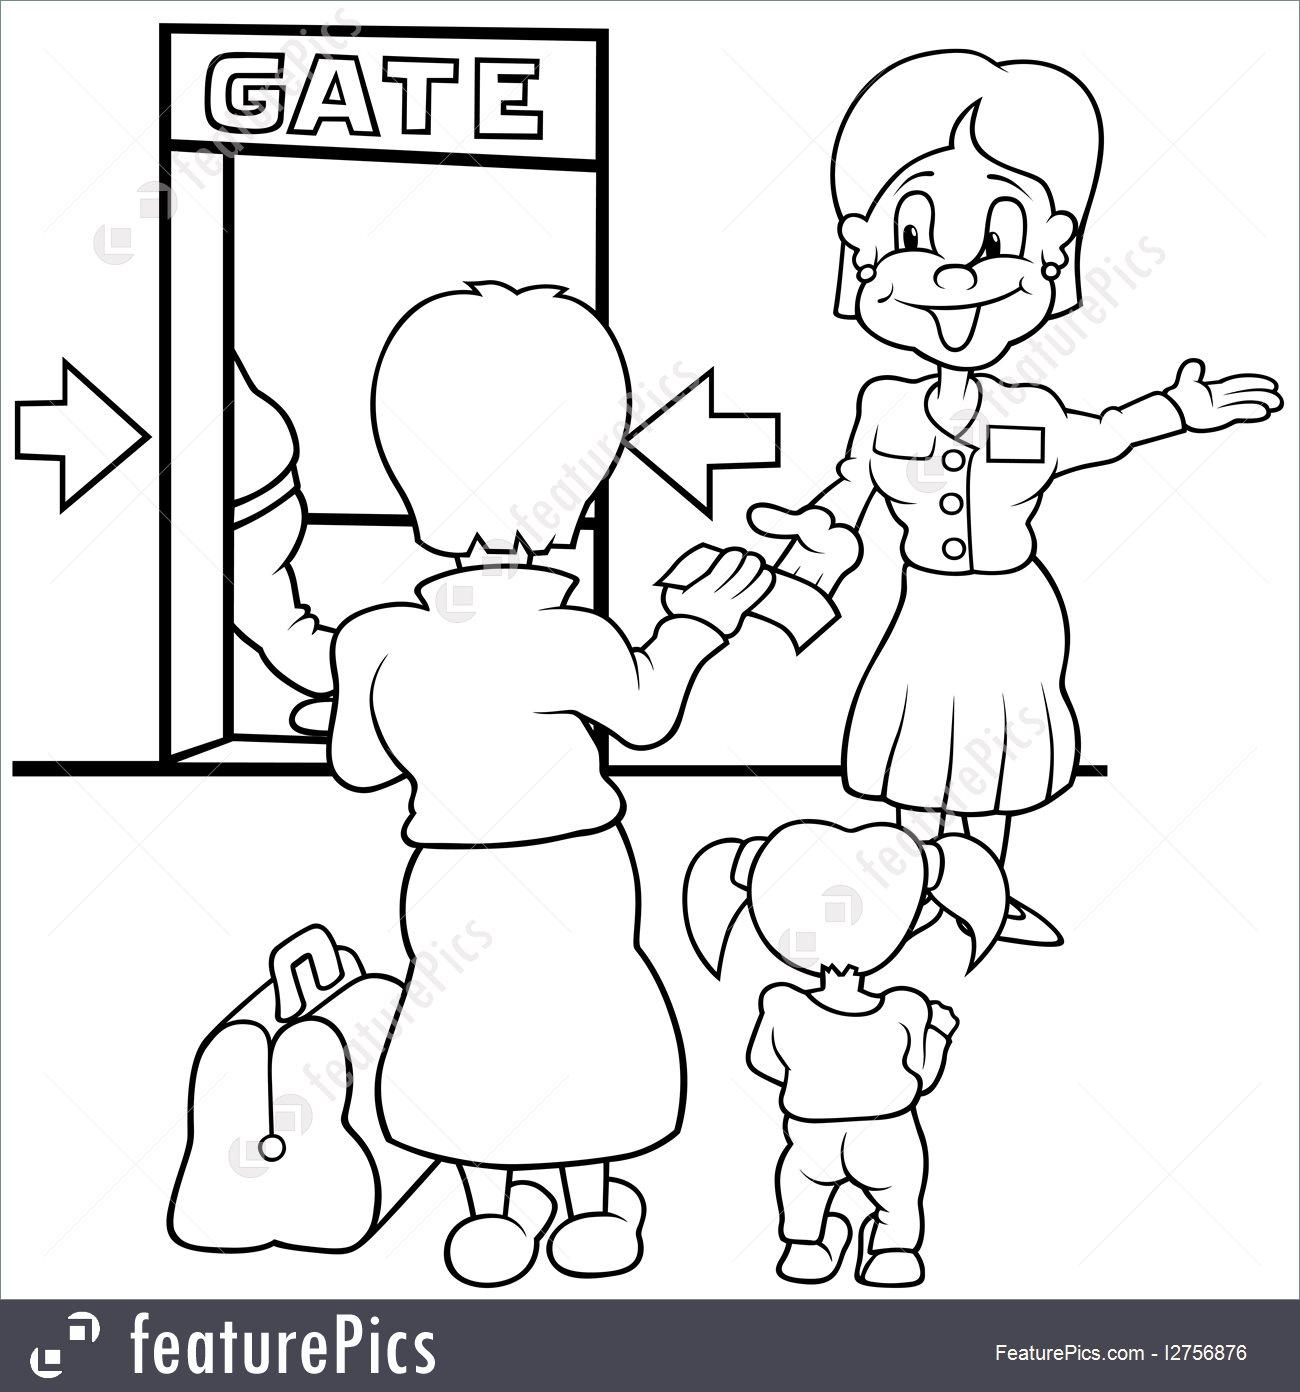 1300x1392 Airport Gate Illustration